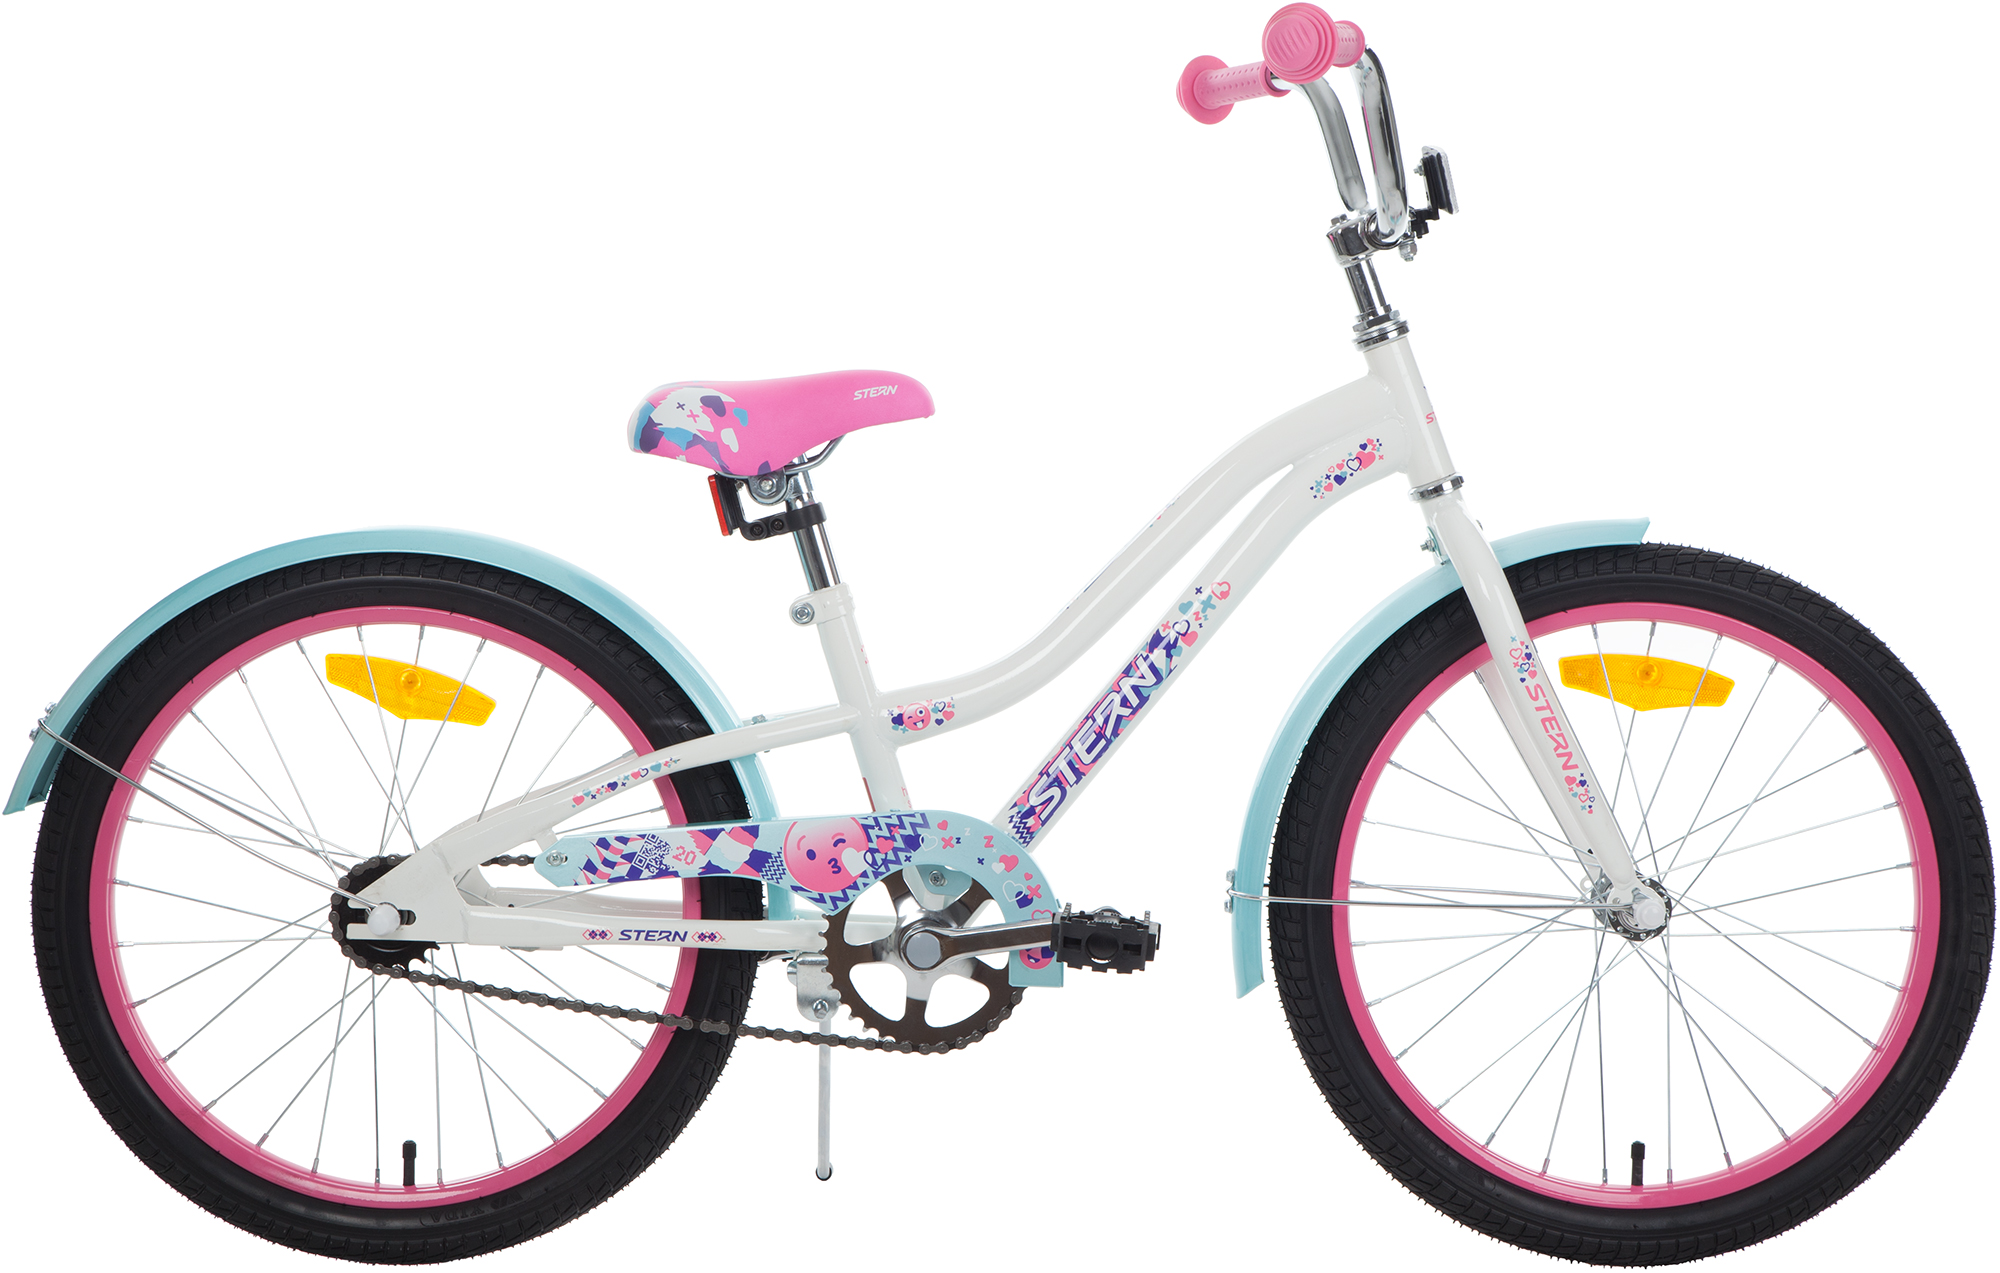 Stern Велосипед подростковый женский Stern Fantasy 20 цена